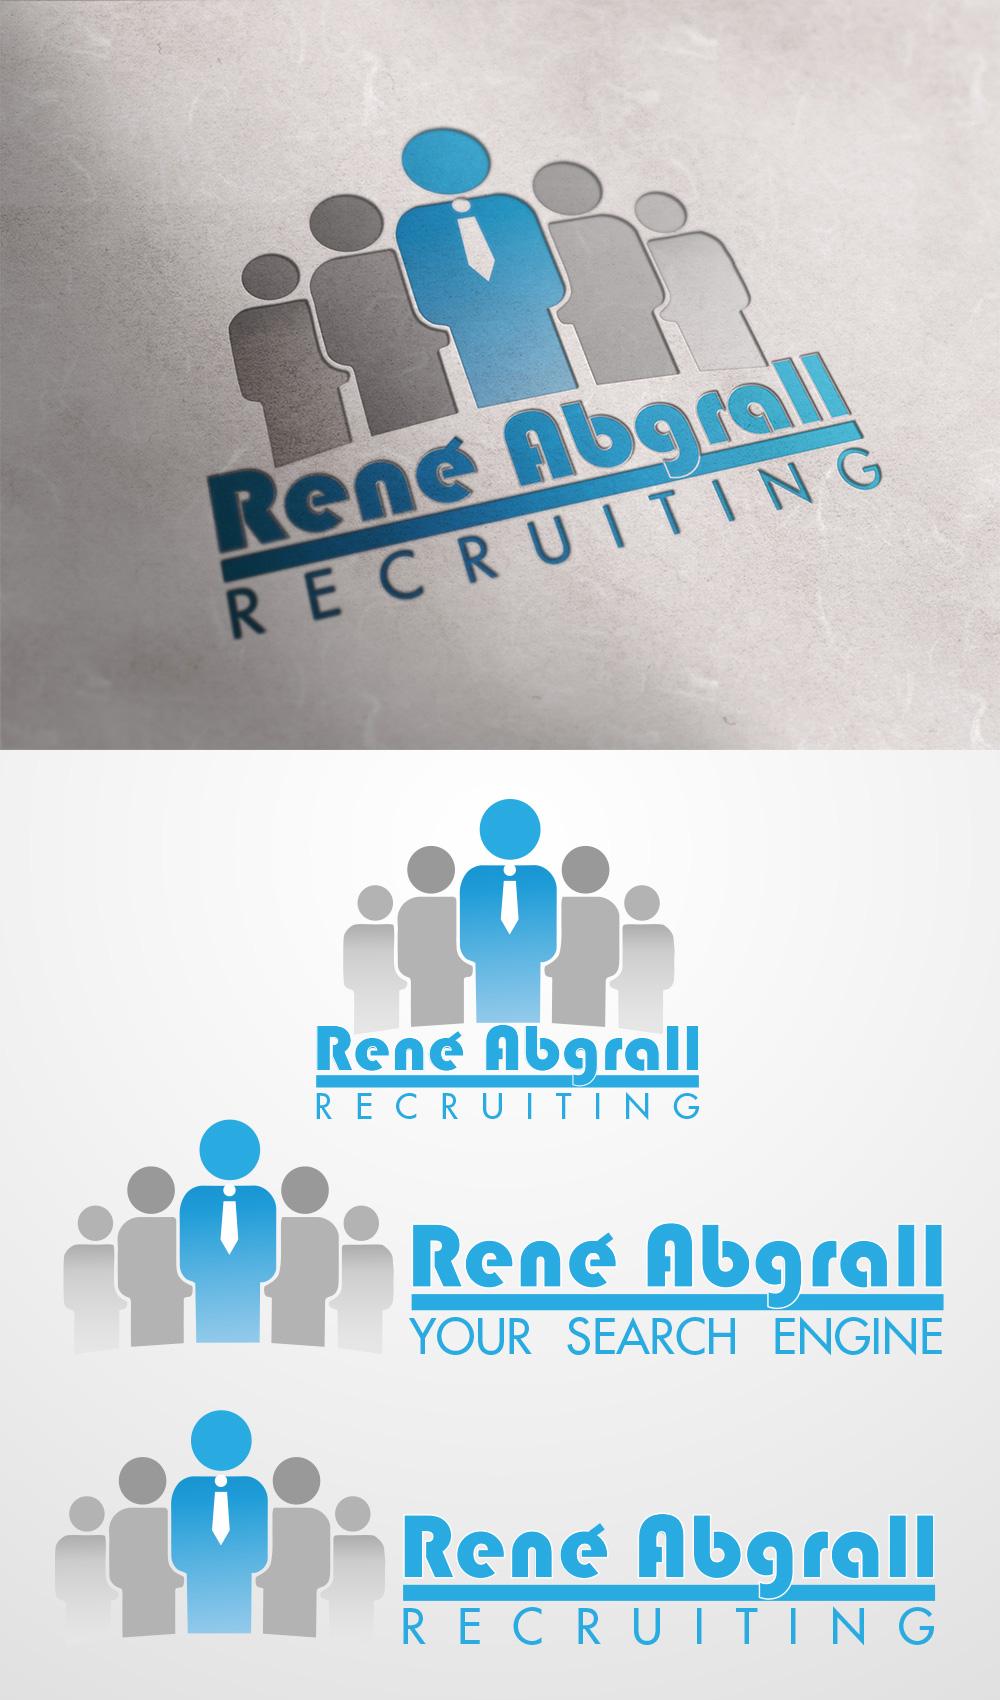 Logo Design by nrzv - Entry No. 26 in the Logo Design Contest Artistic Logo Design for René Abgrall Recruiting.